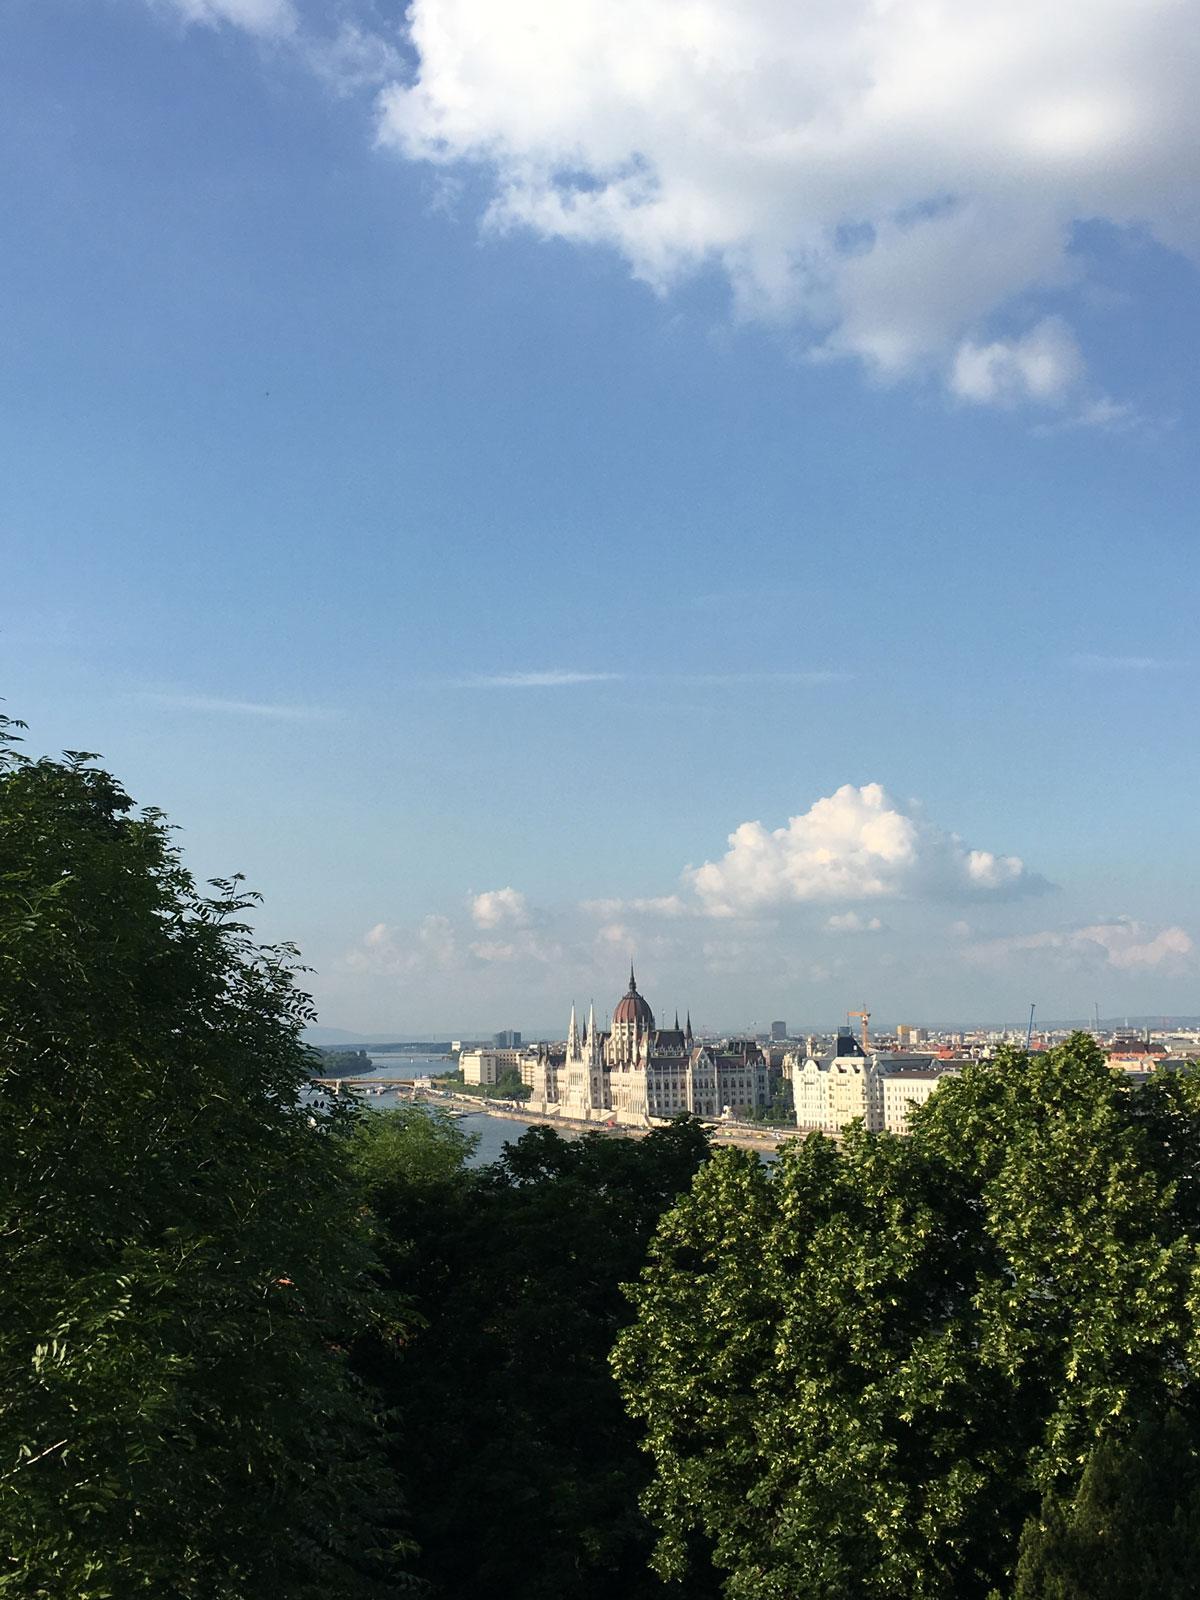 budapest_parliament5.jpg